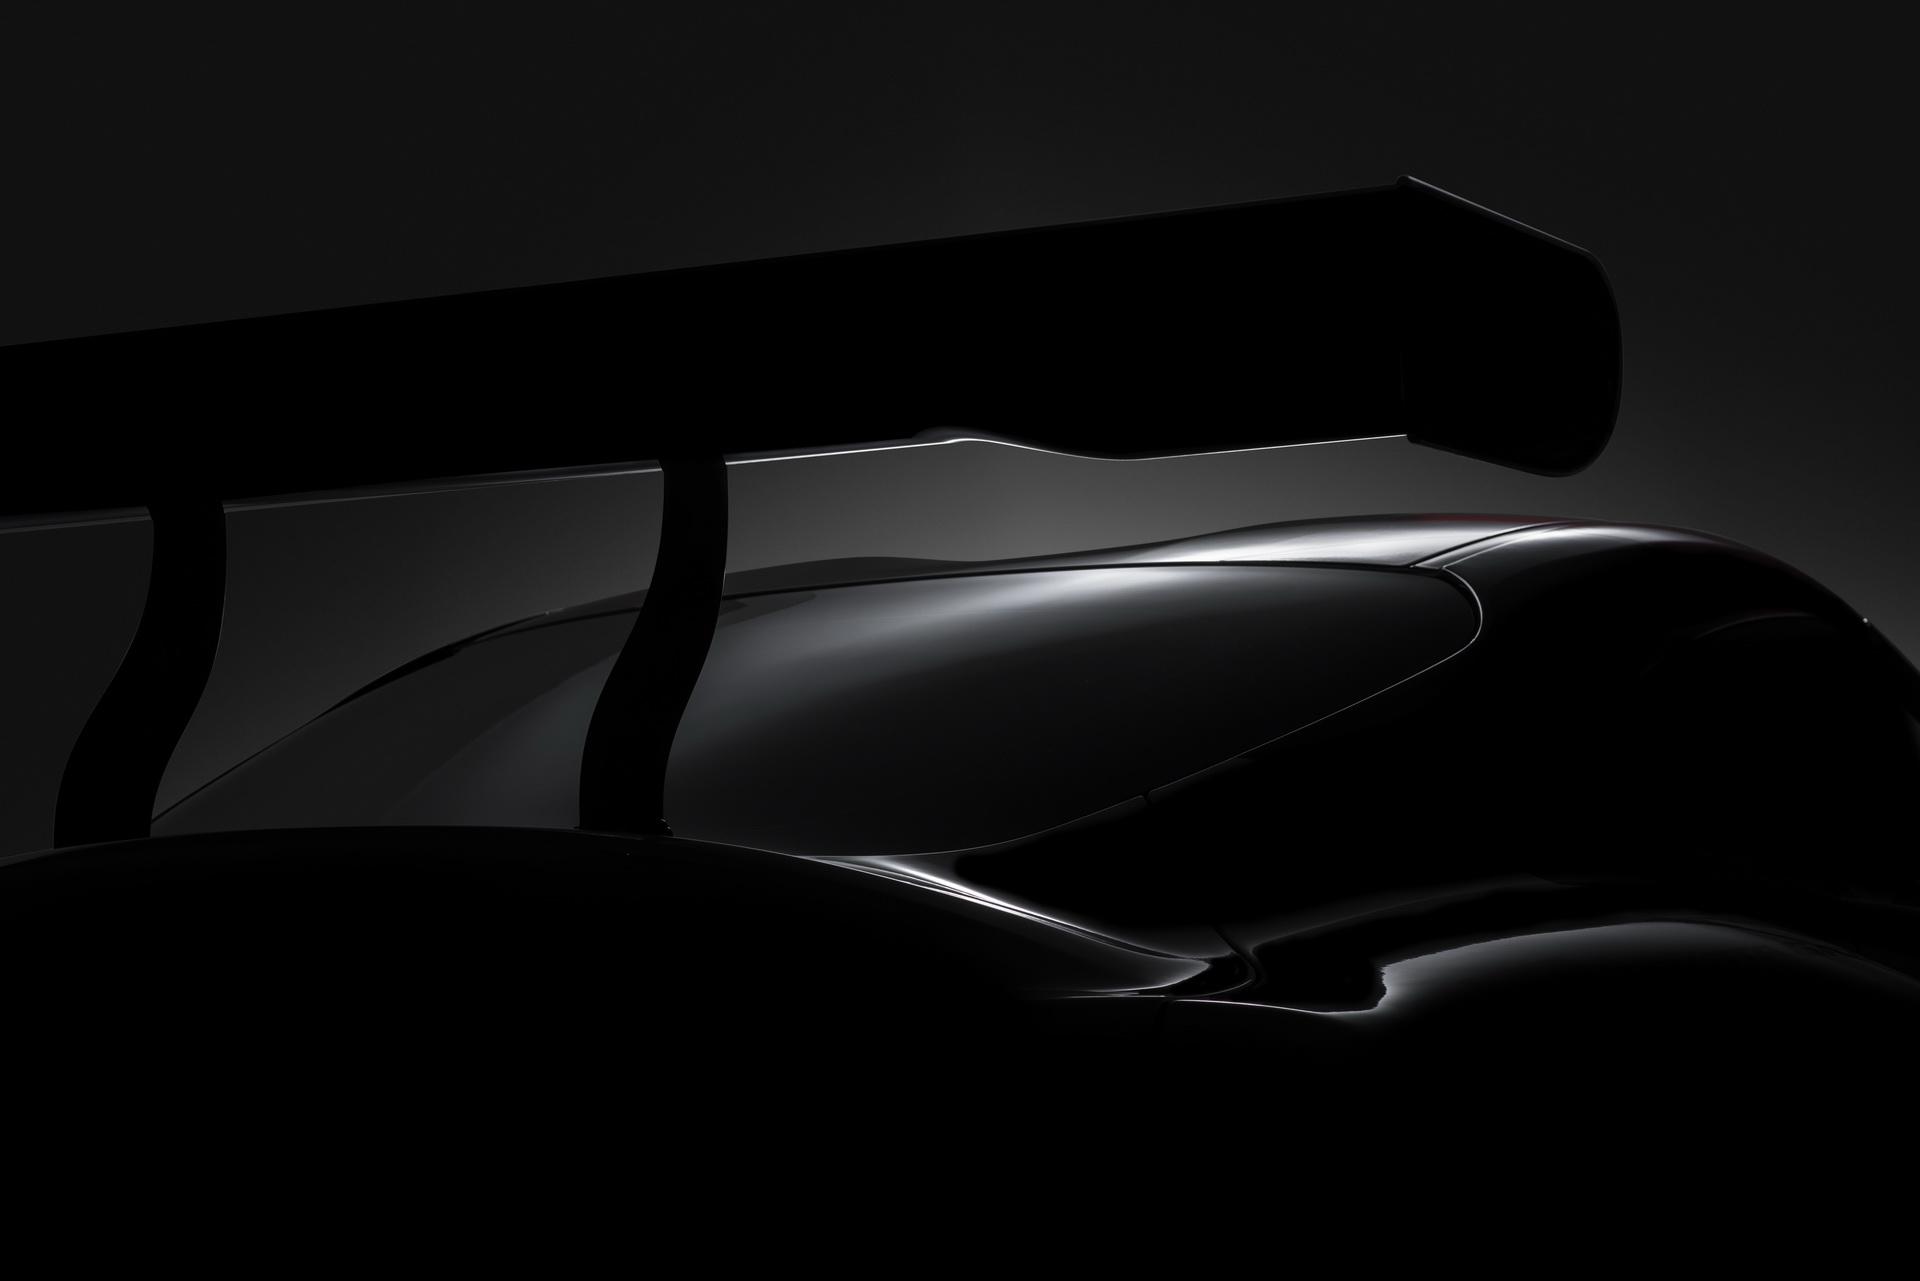 Genfben mutatkozik be az új Toyota Supra